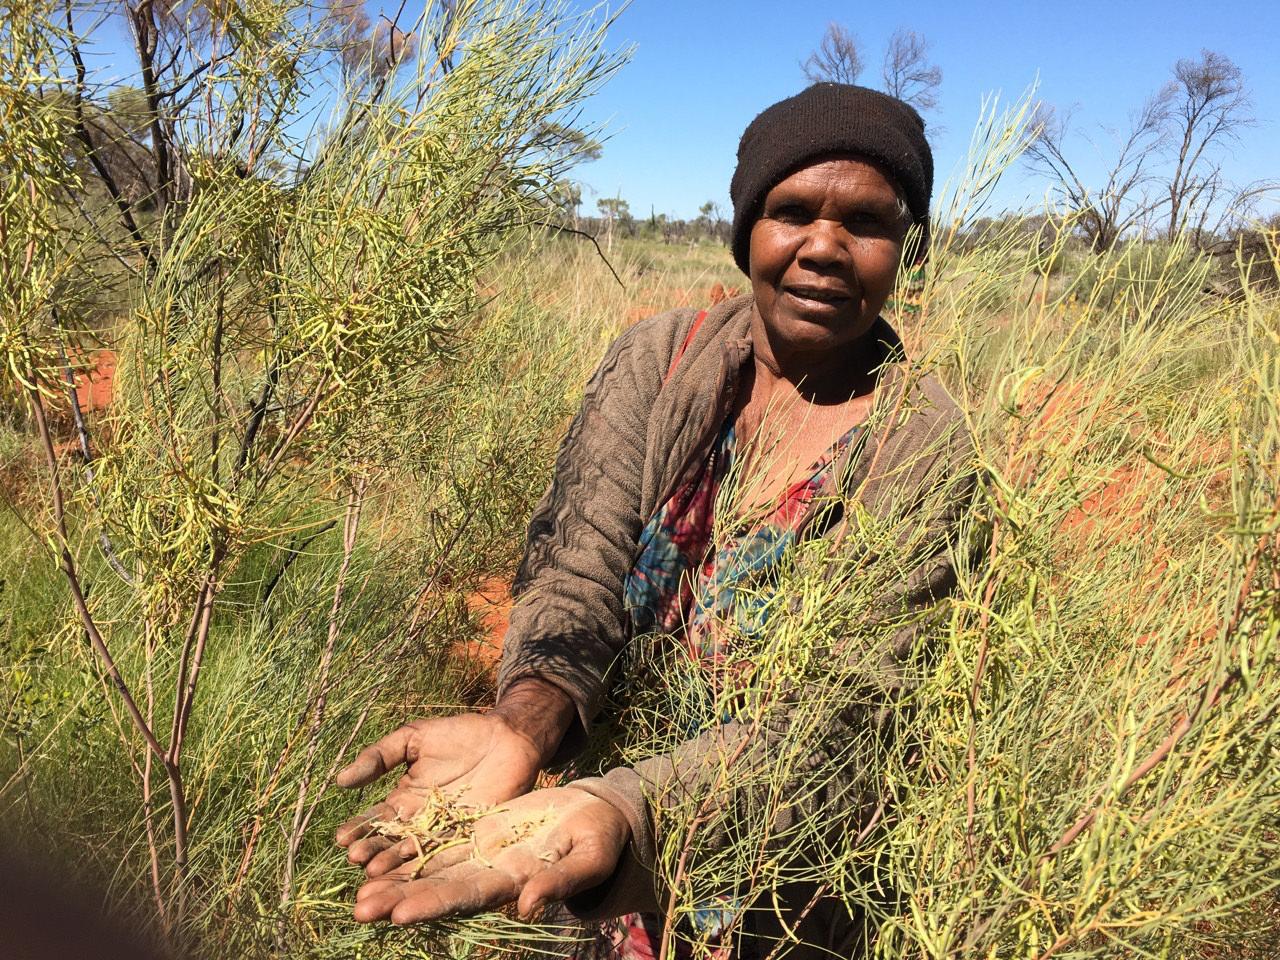 Colleen Ngwarraye Morton collecting bush medicine. Photo: Lara Damiani.